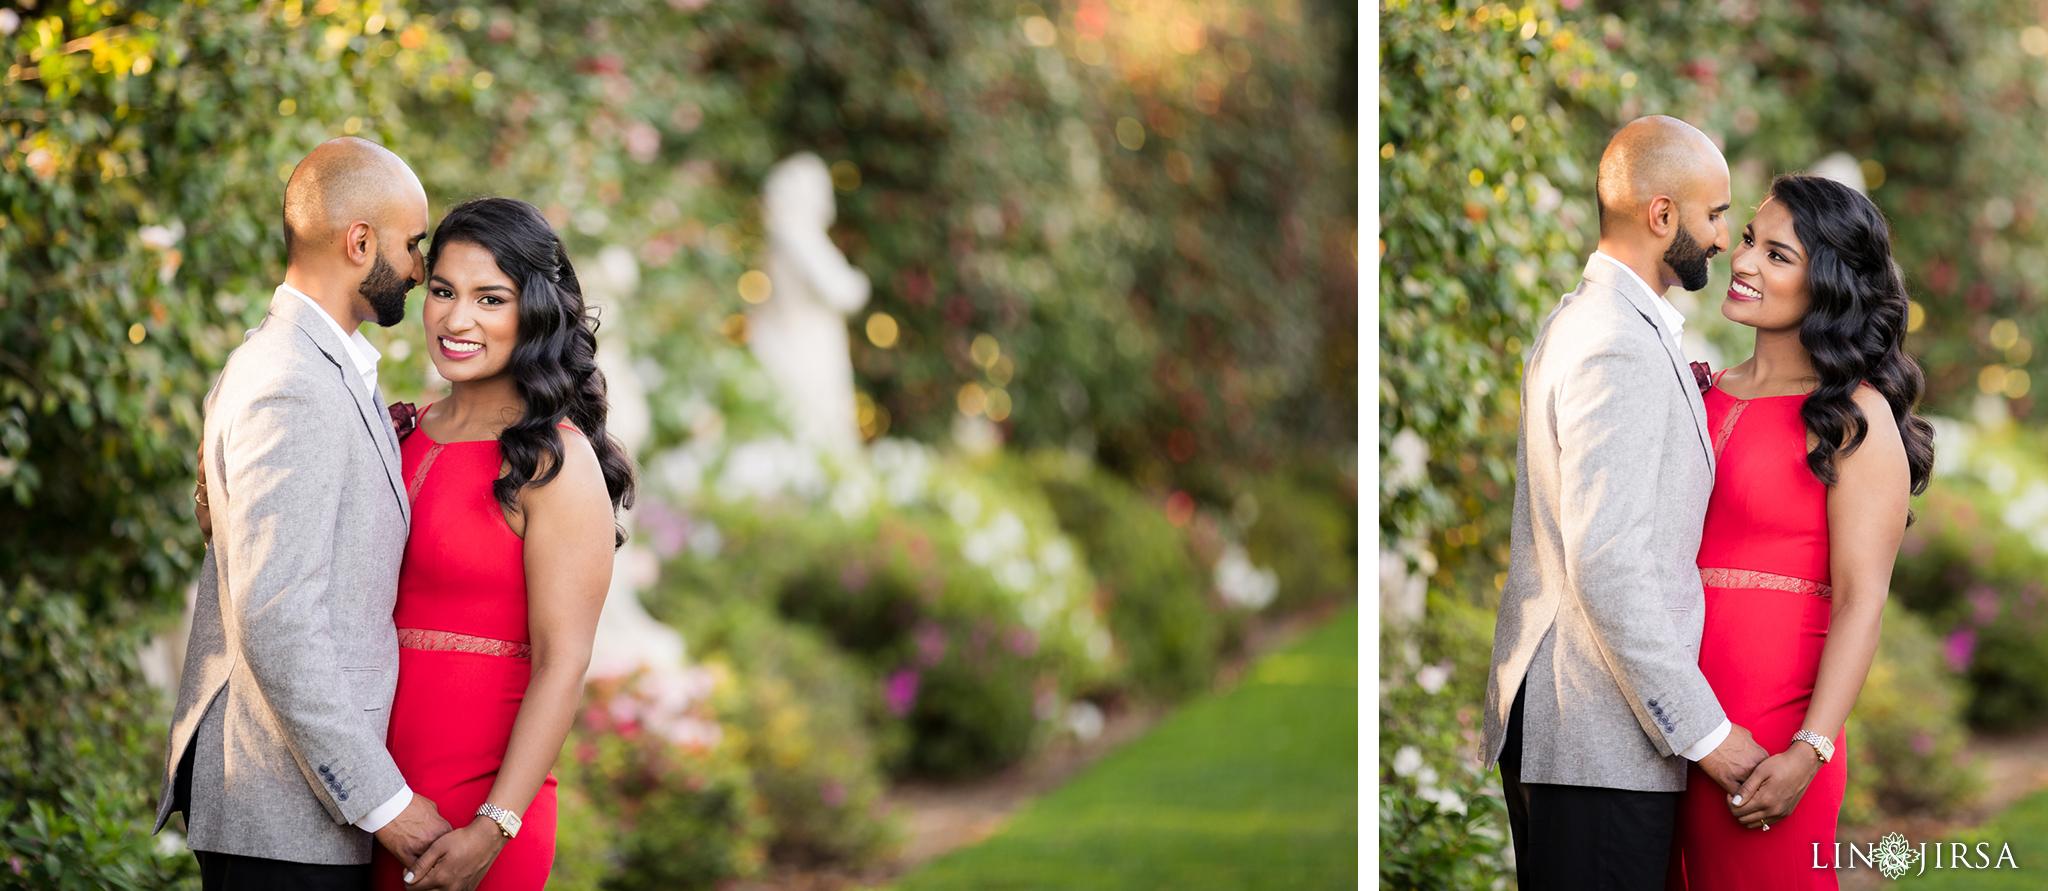 21-huntington-garden-engagement-photography